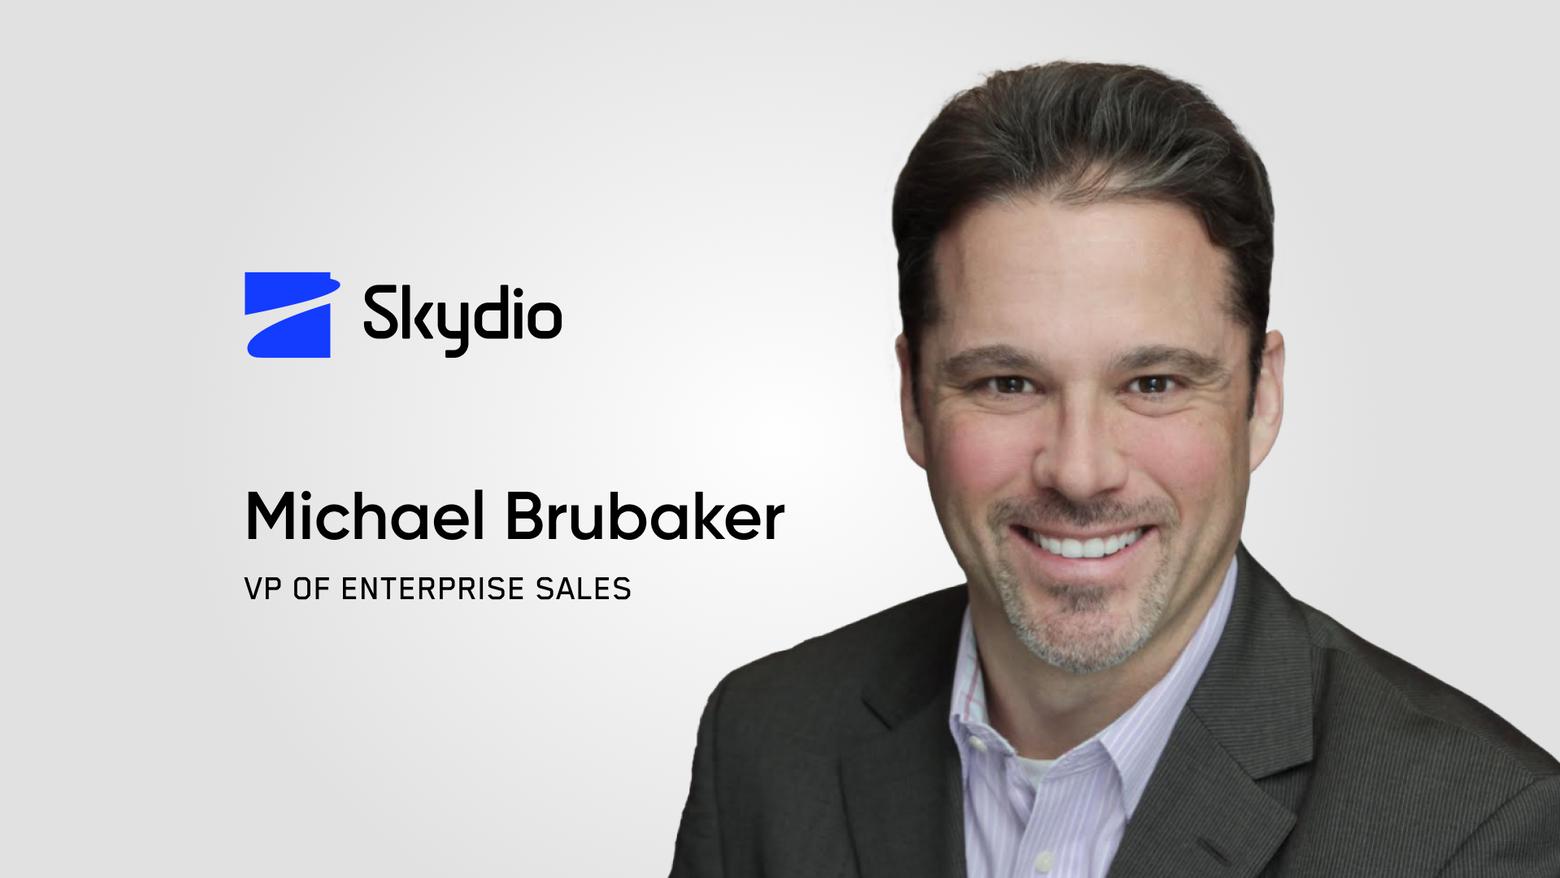 Skydio VP of Enterprise Sales, Michael Brubaker